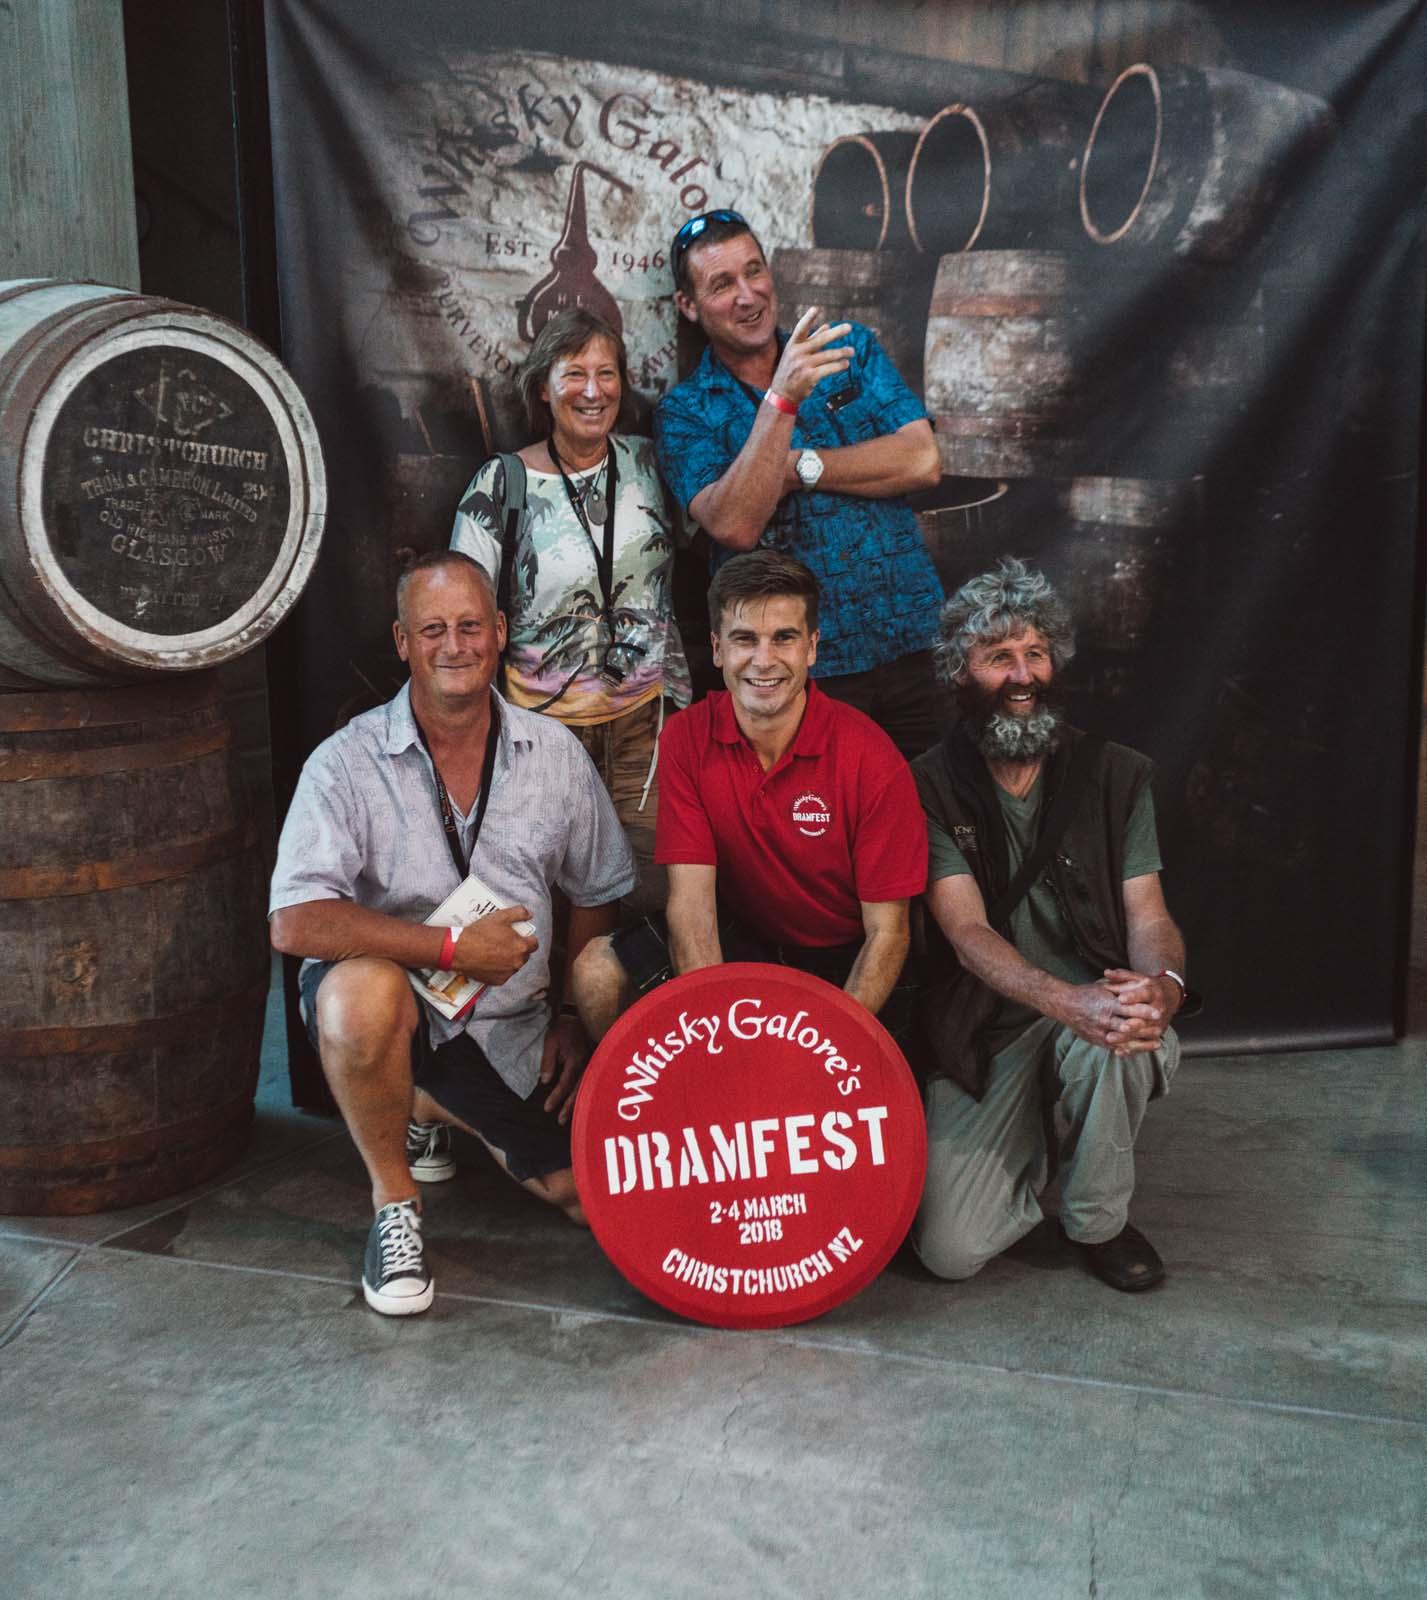 Dramfest 2018 for Whisky Galore-175.jpg